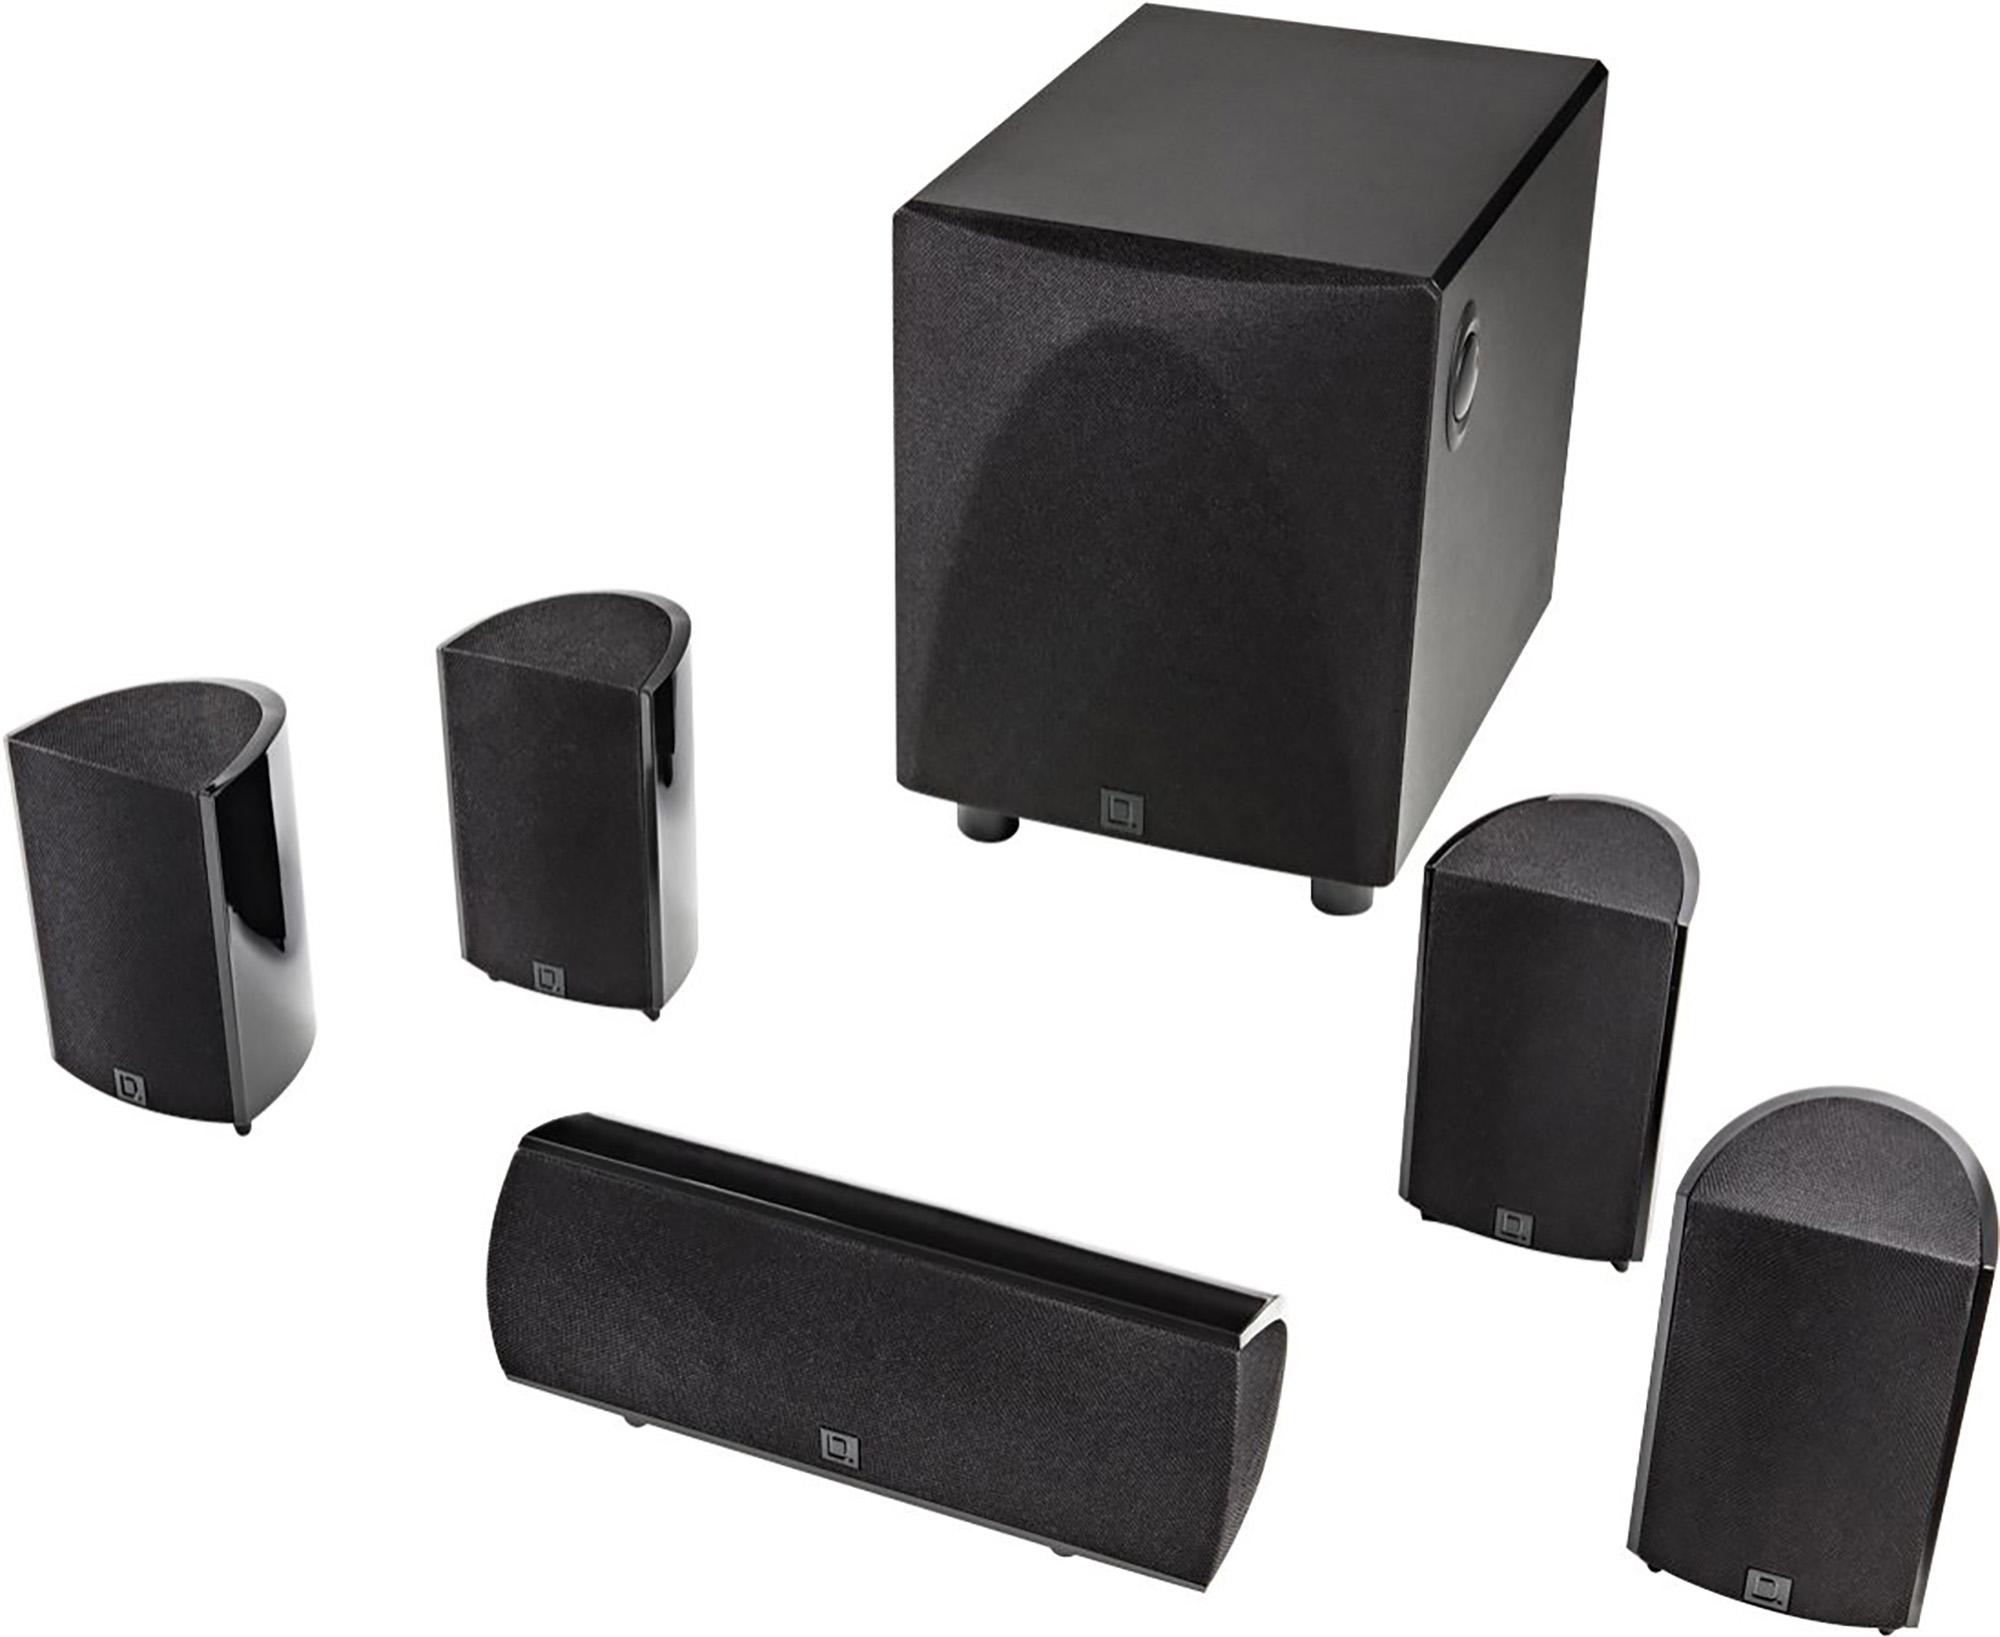 Definitive Technology ProCinema 6D 5.1-Canais Home Theater Speaker System